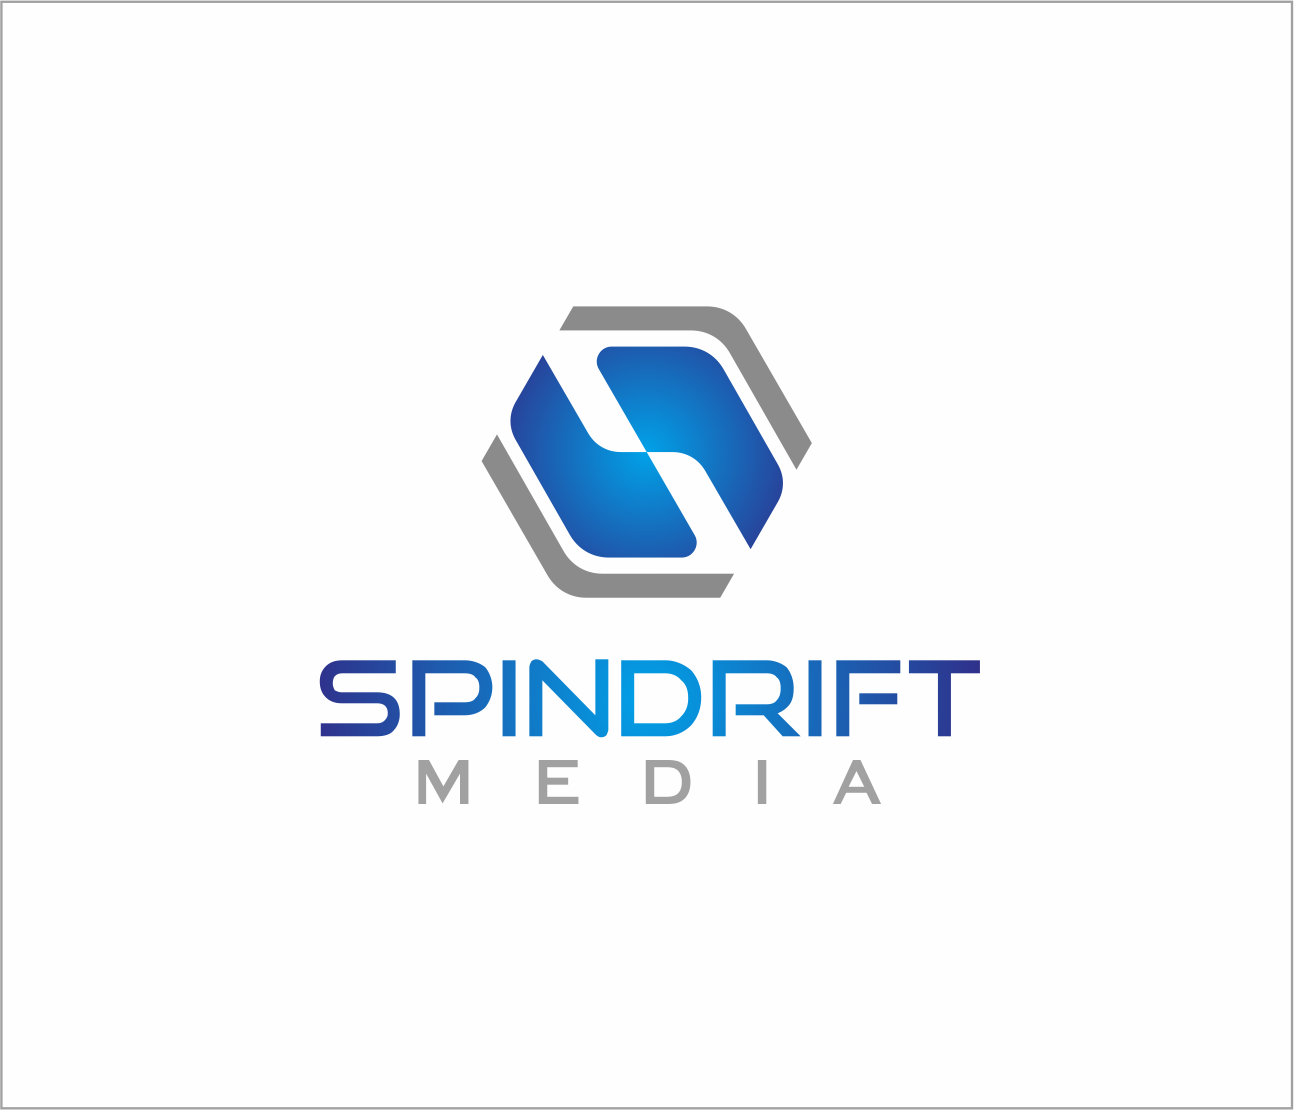 Logo Design by Armada Jamaluddin - Entry No. 53 in the Logo Design Contest Inspiring Logo Design for Spindrift Media.